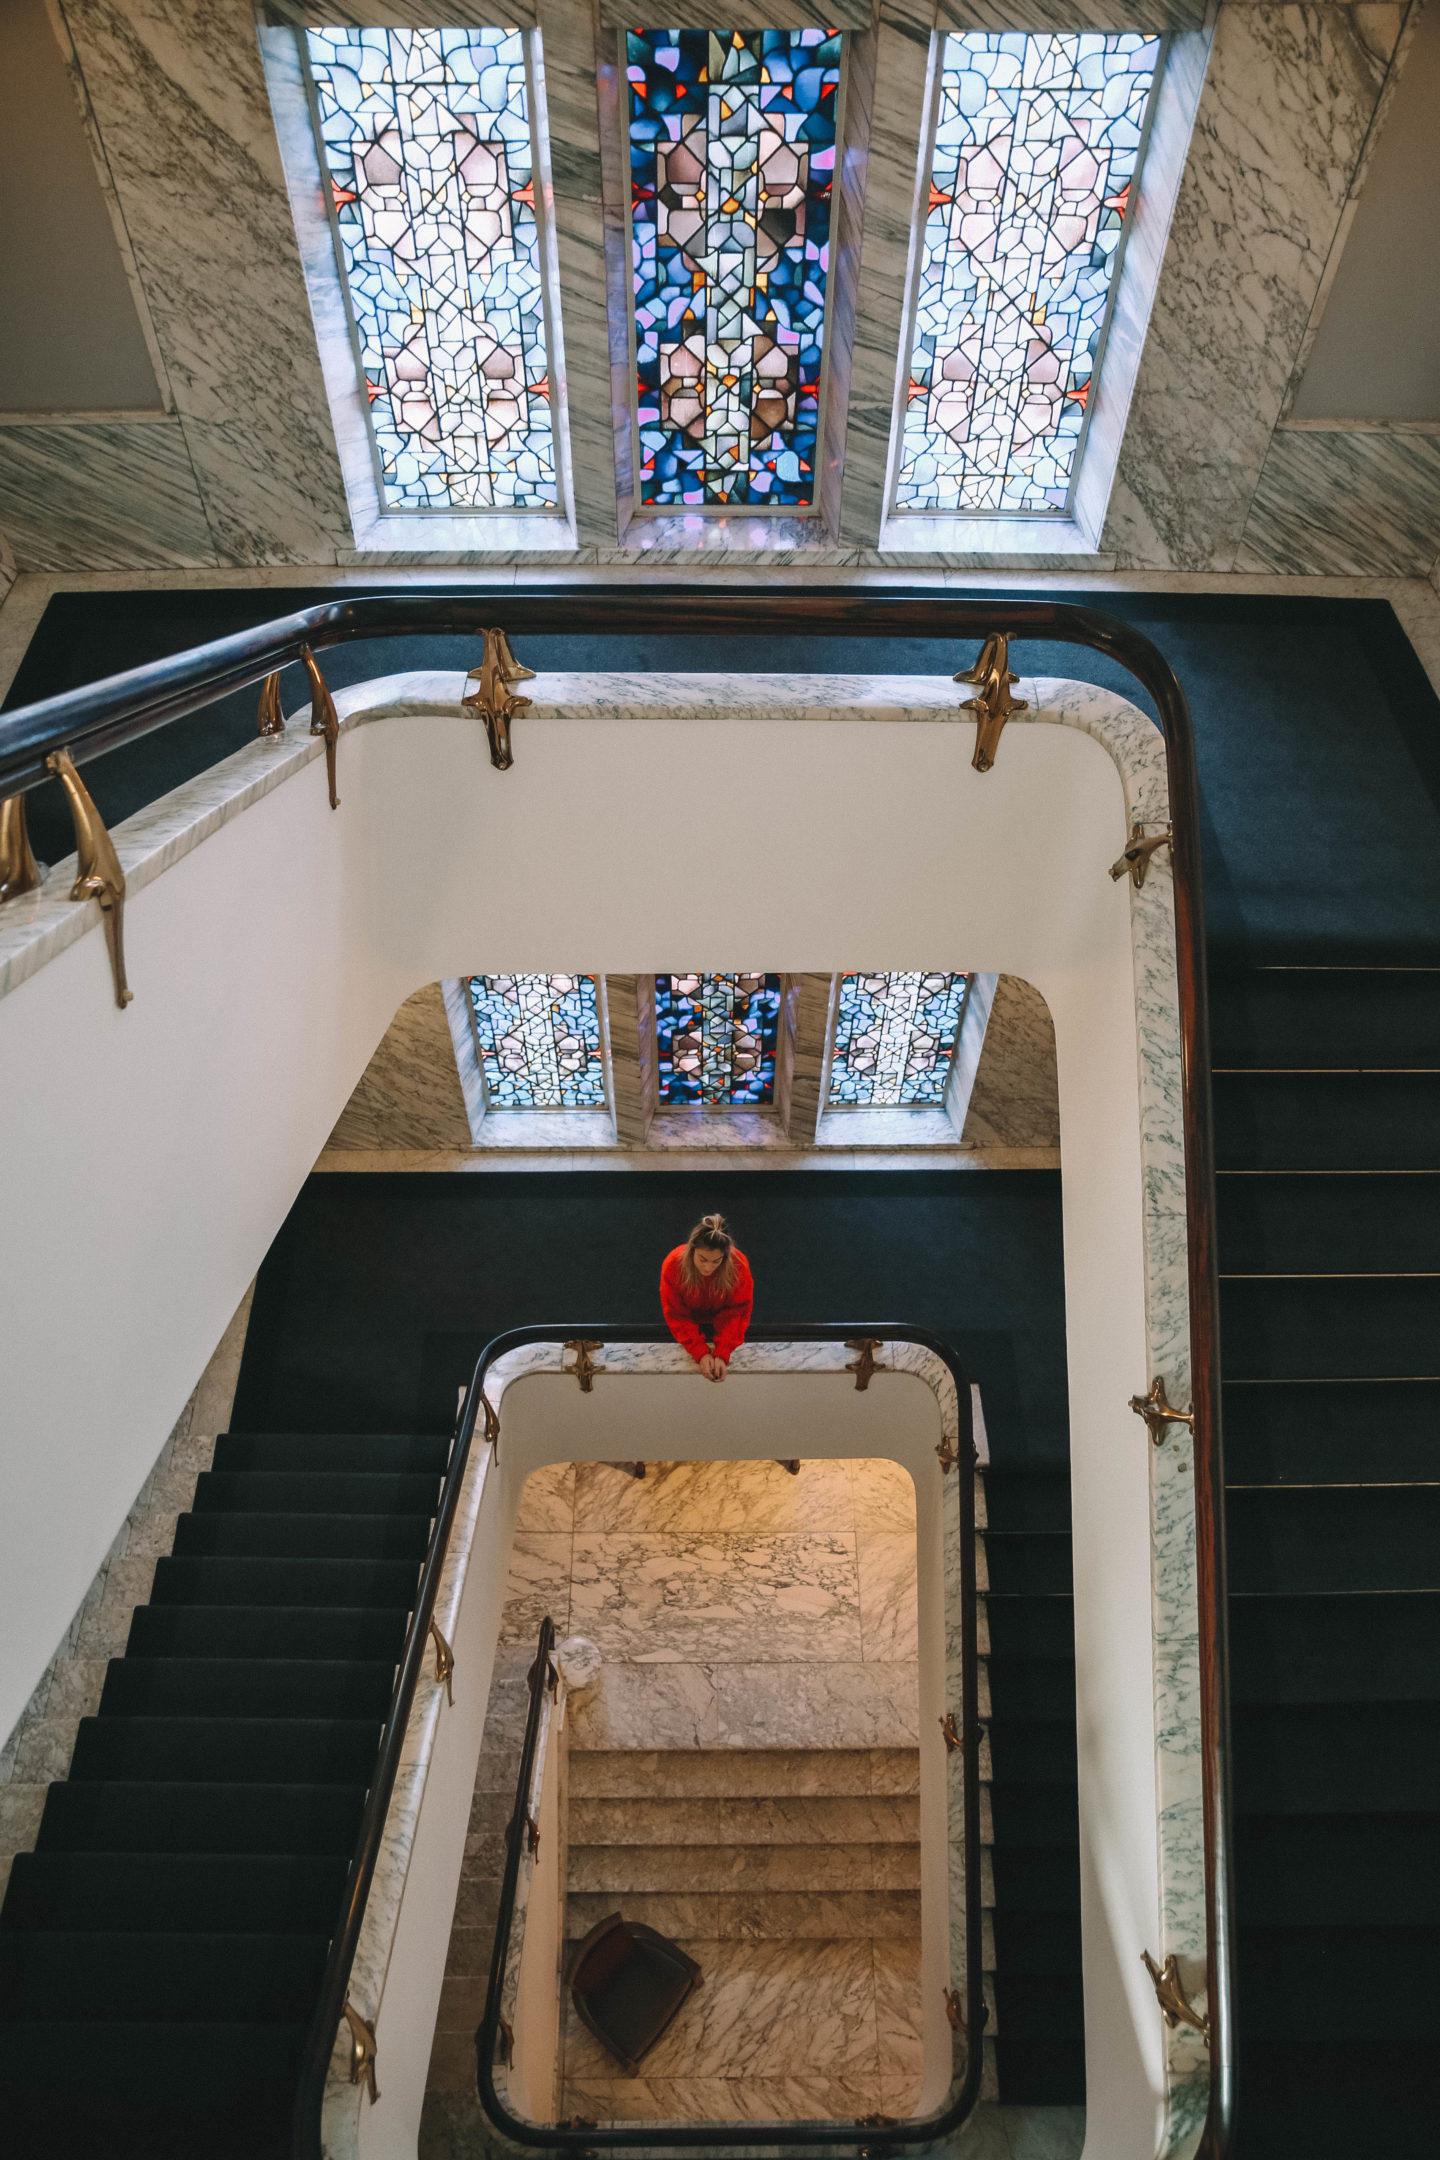 Hôtel Amsterdam - Blondie baby blog mode et voyages